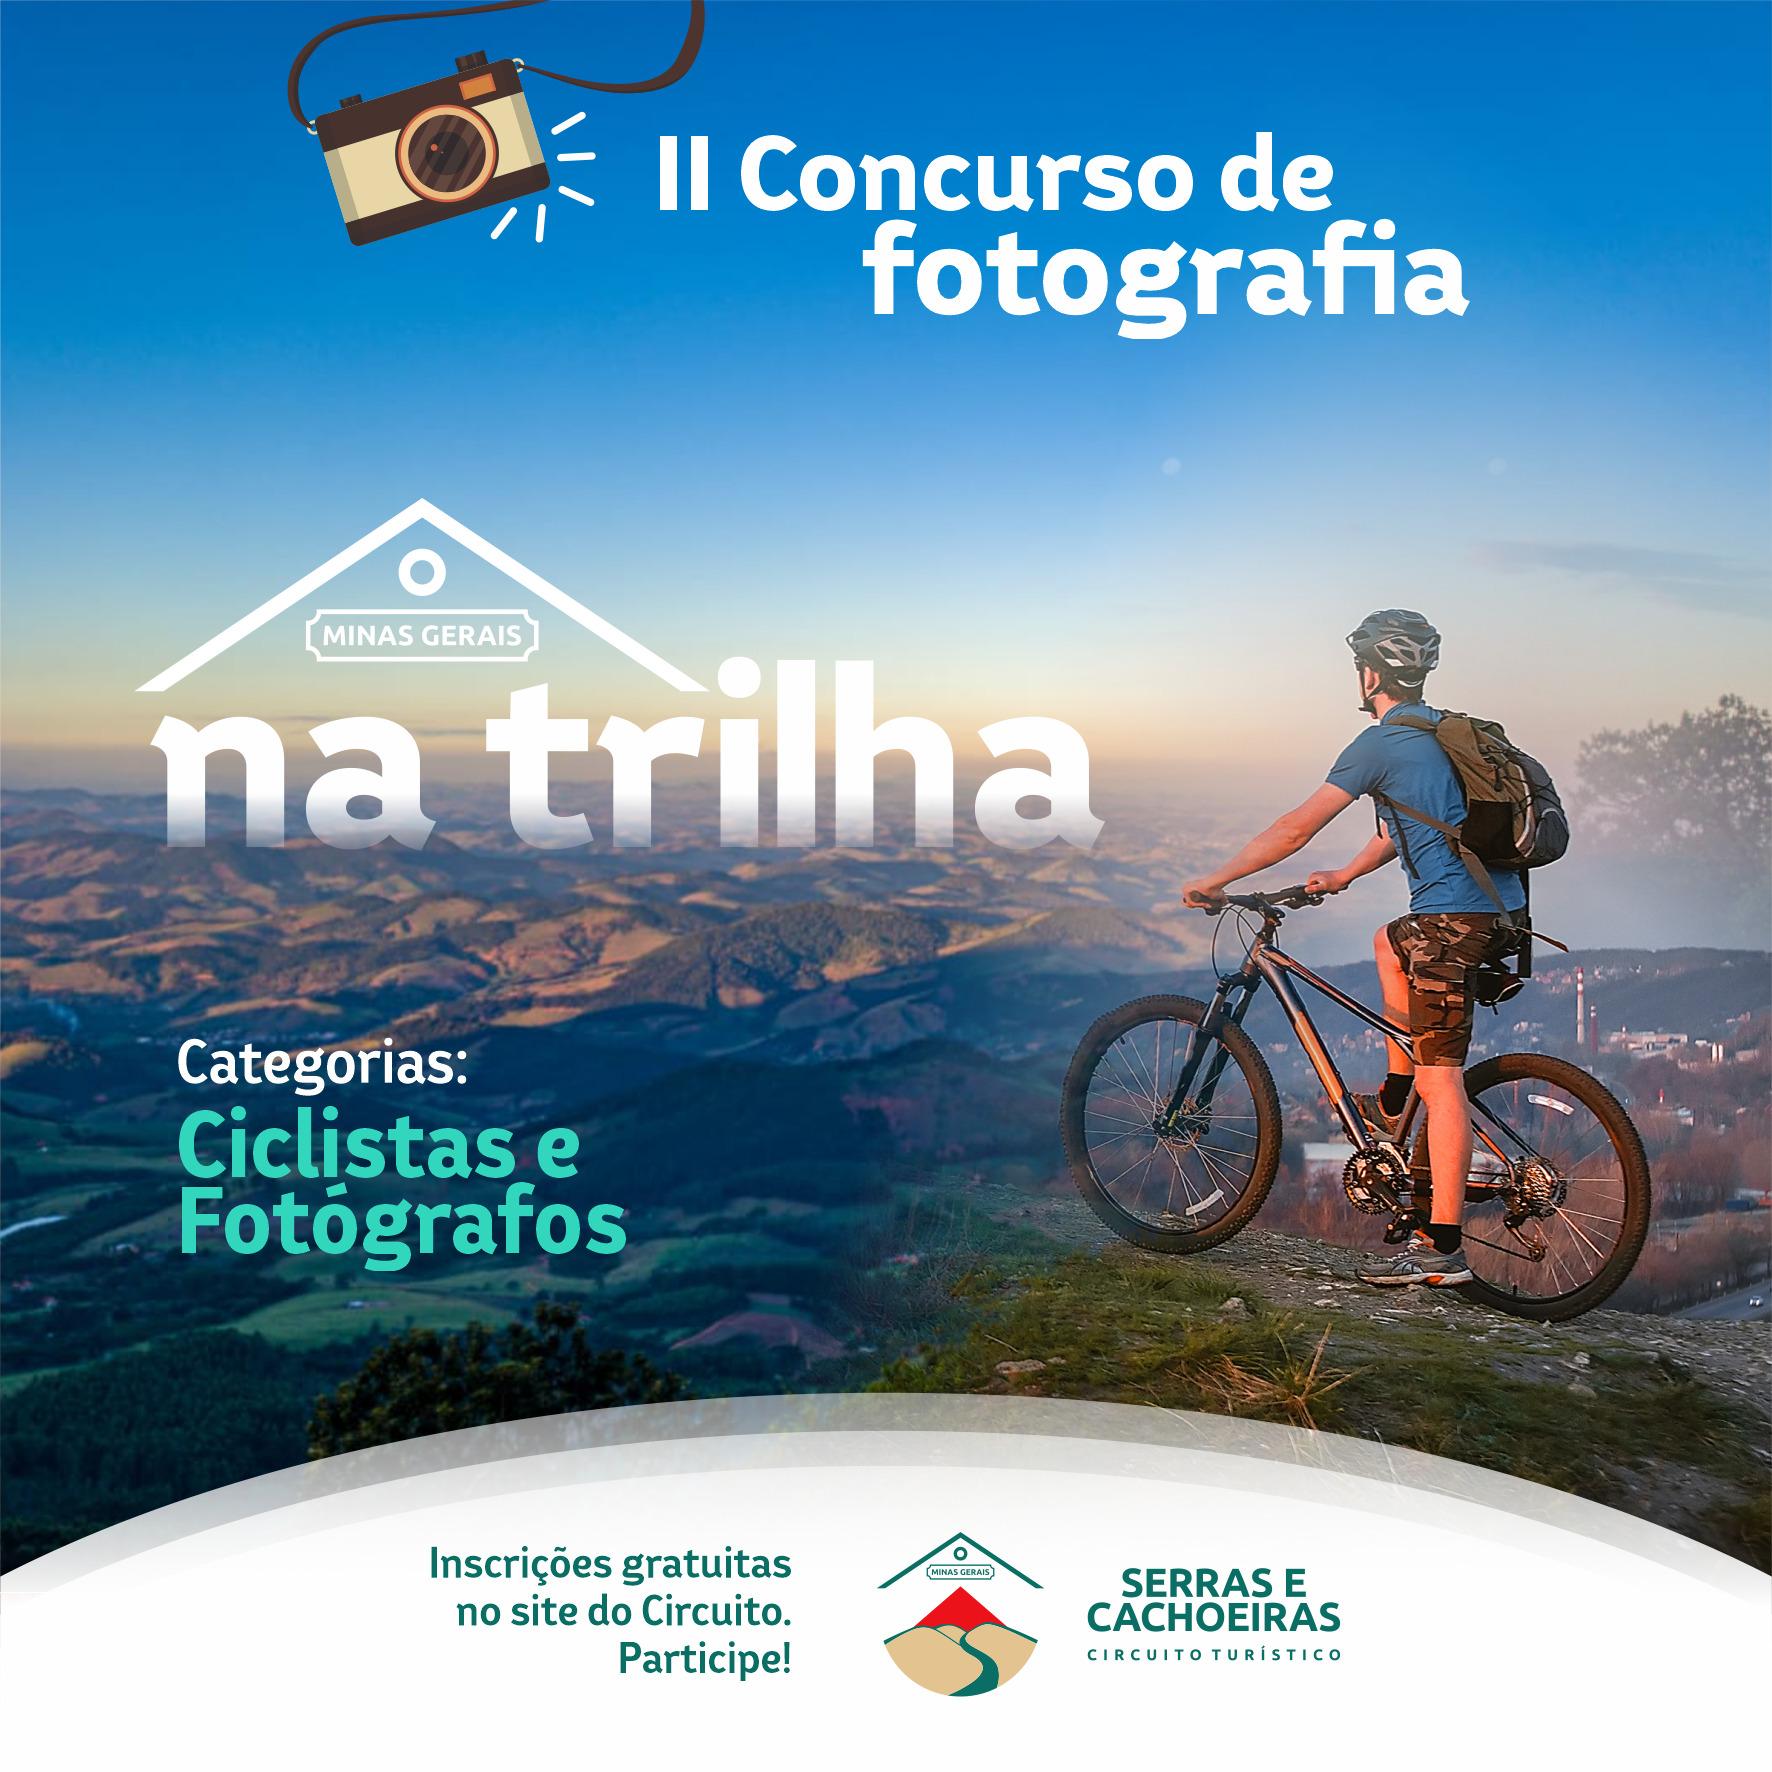 II Concurso de Fotografia Na Trilha2